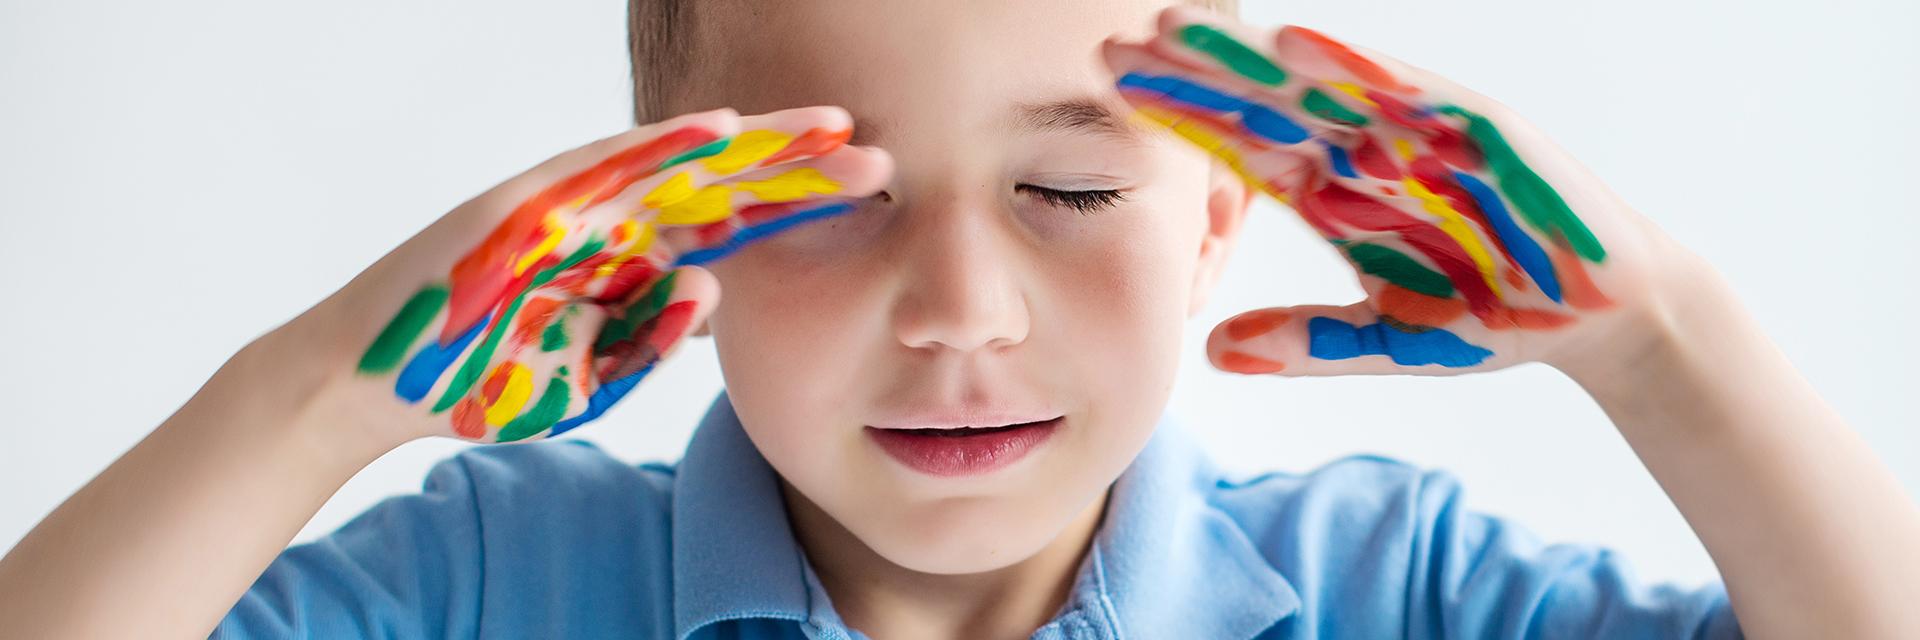 Natuurwetmatig denken en autisme